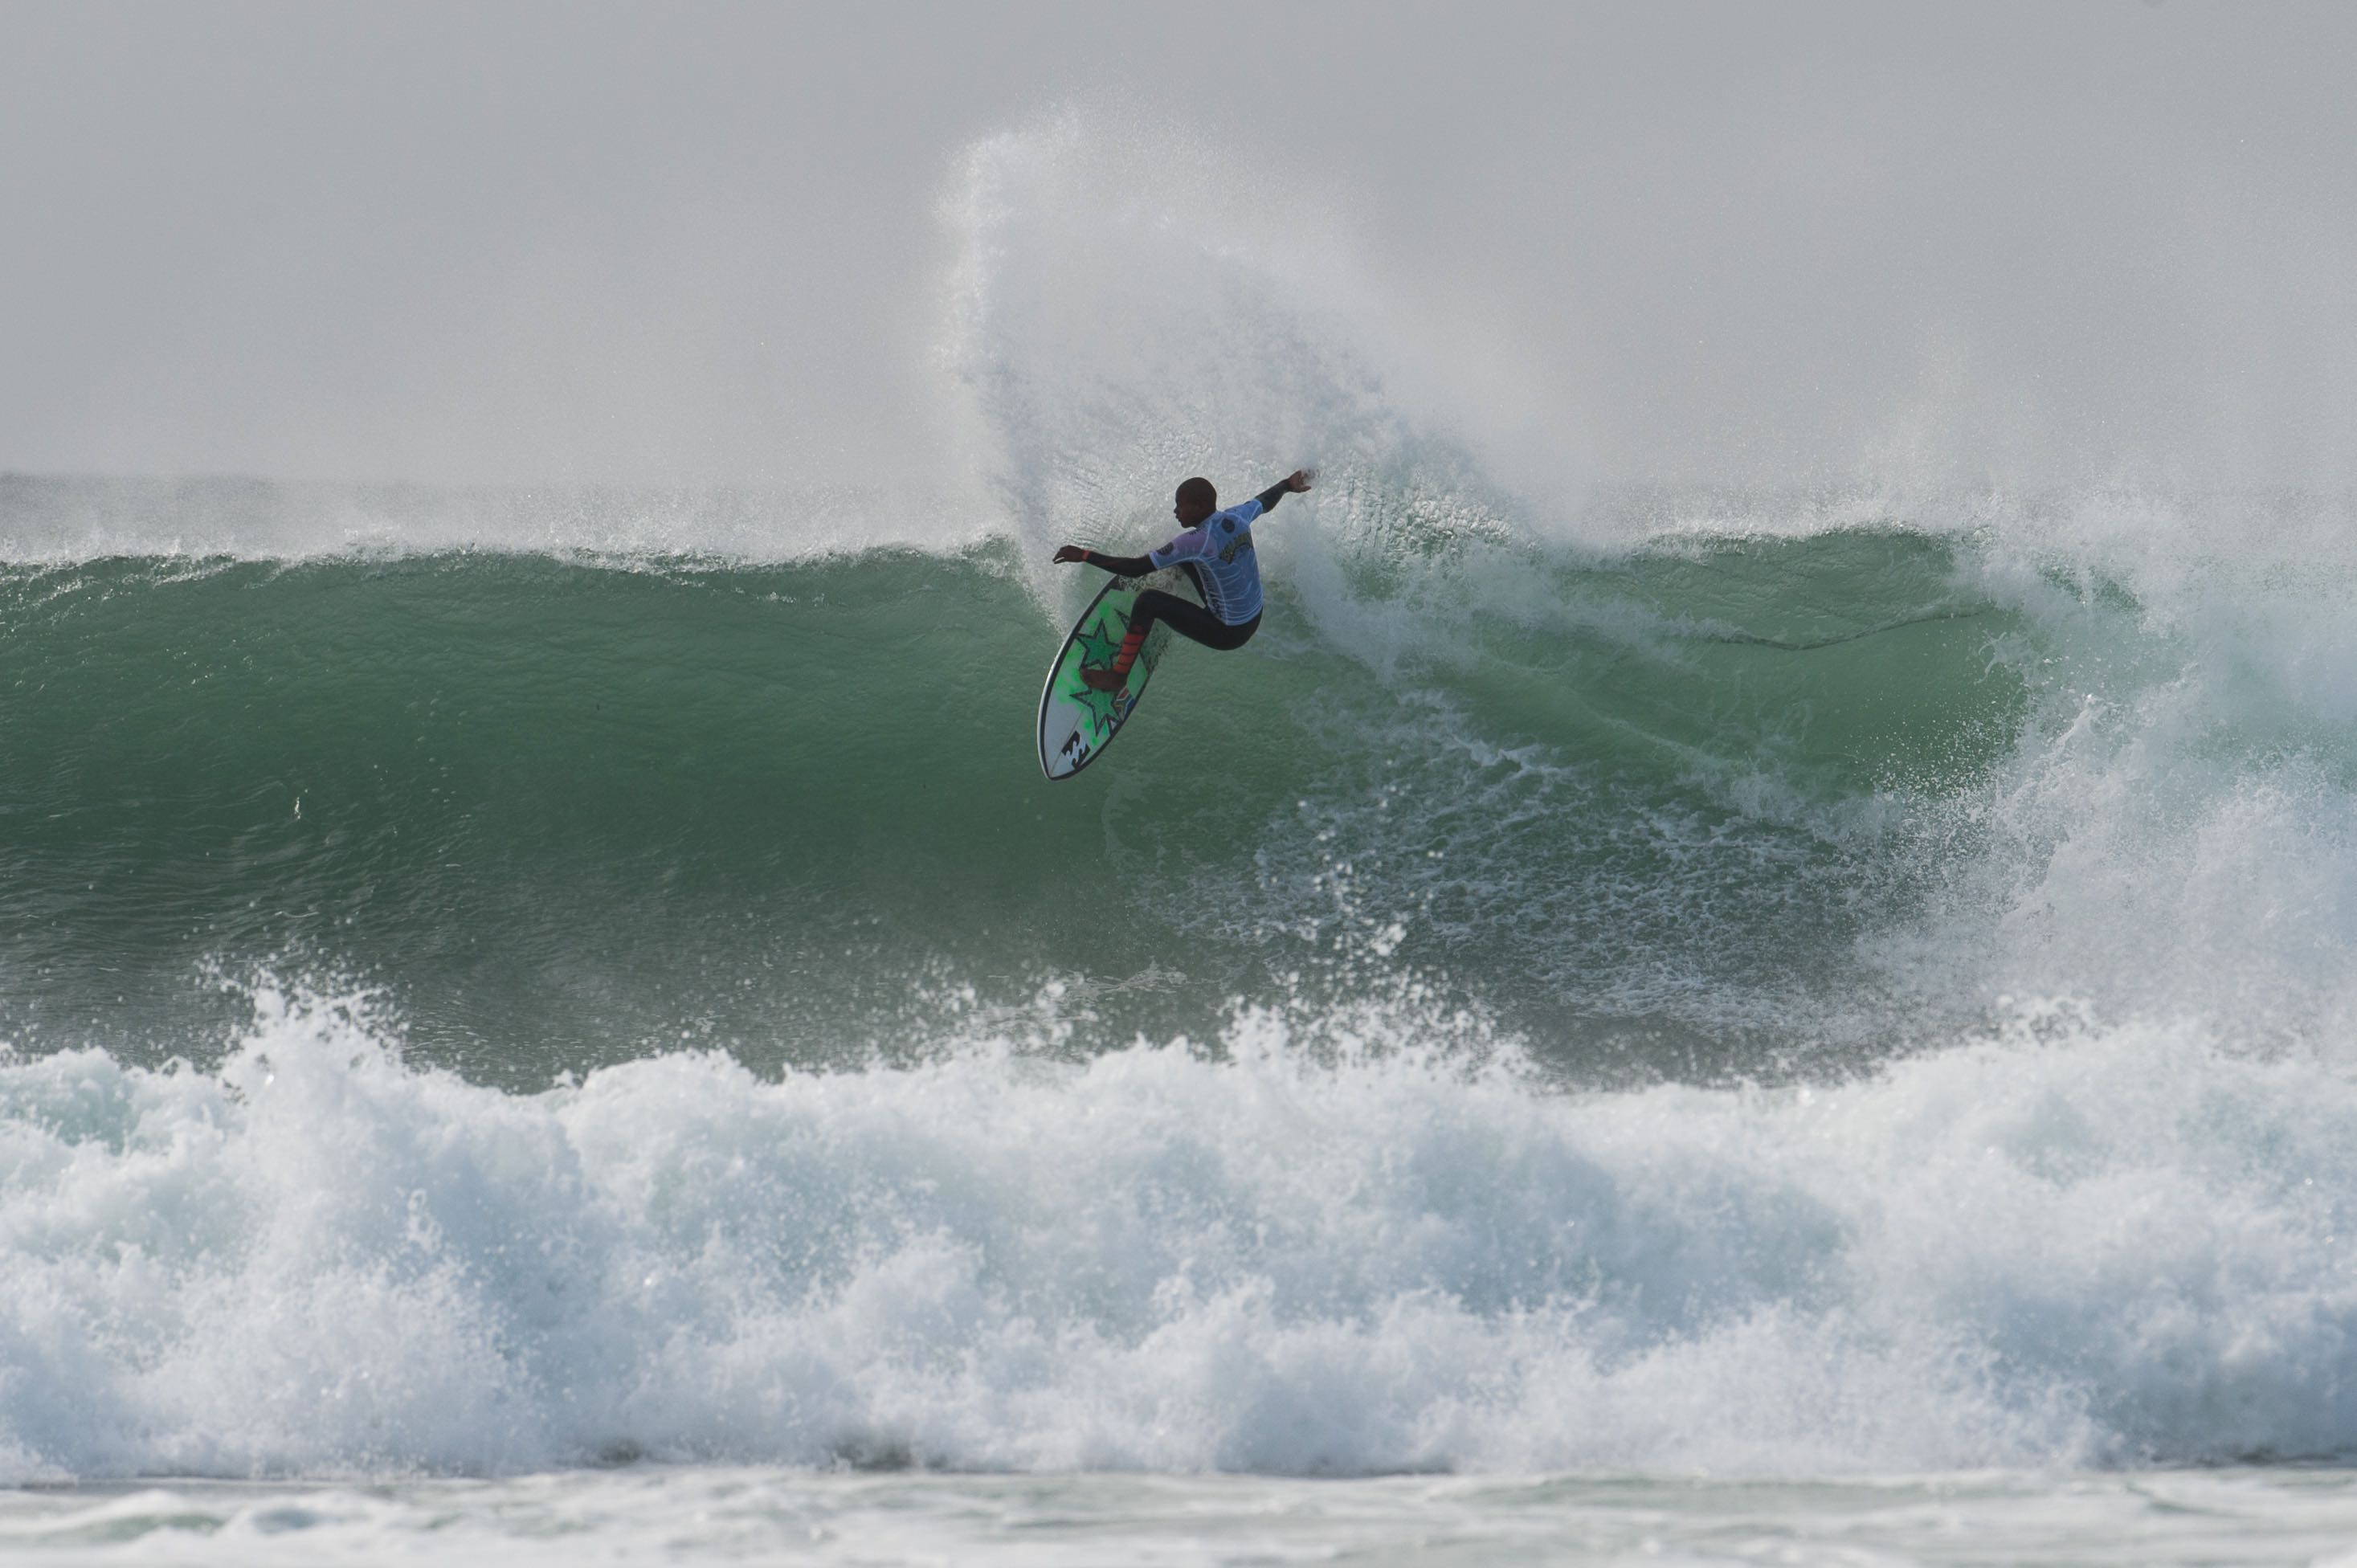 Angelo Faulkner surfing in the Billabong Junior Series